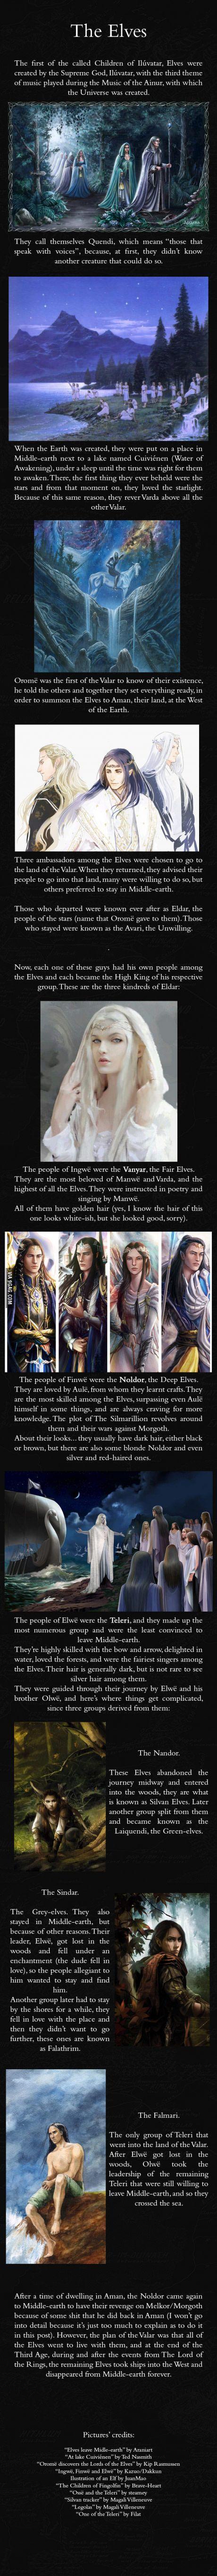 The Elves - J.R.R. Mythology